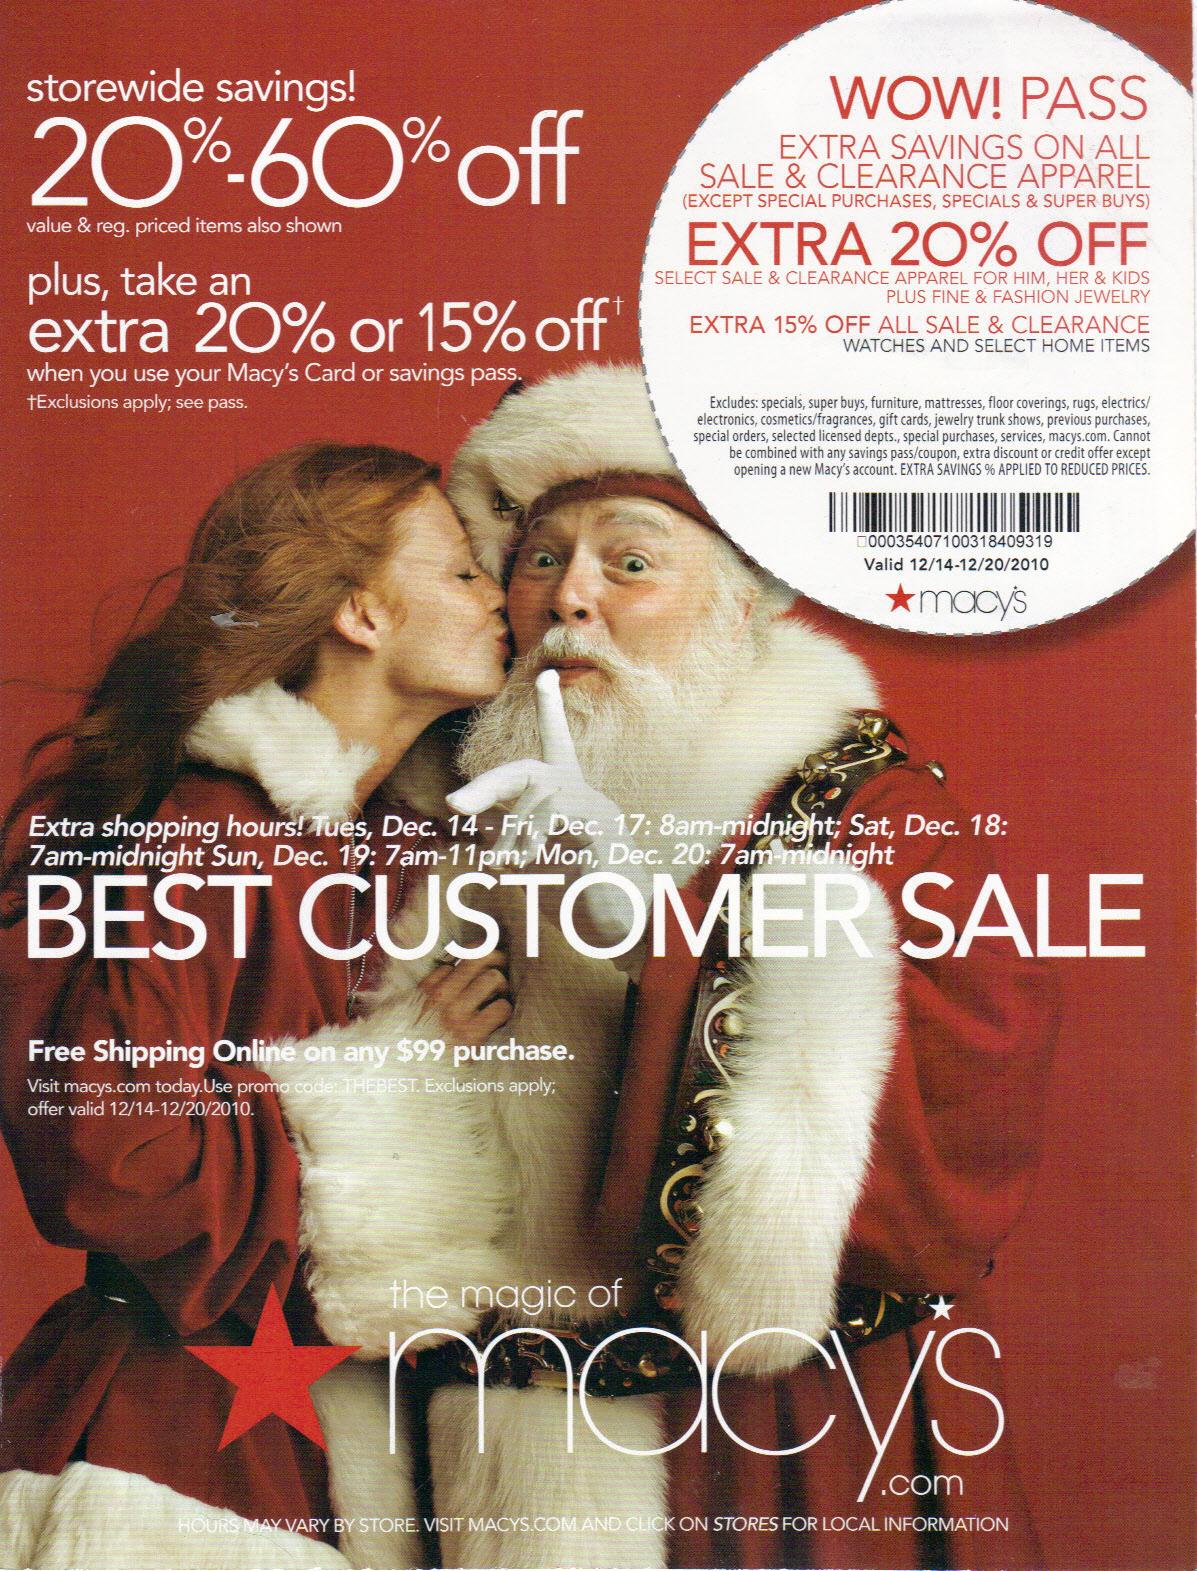 Macy's Santa Claus!